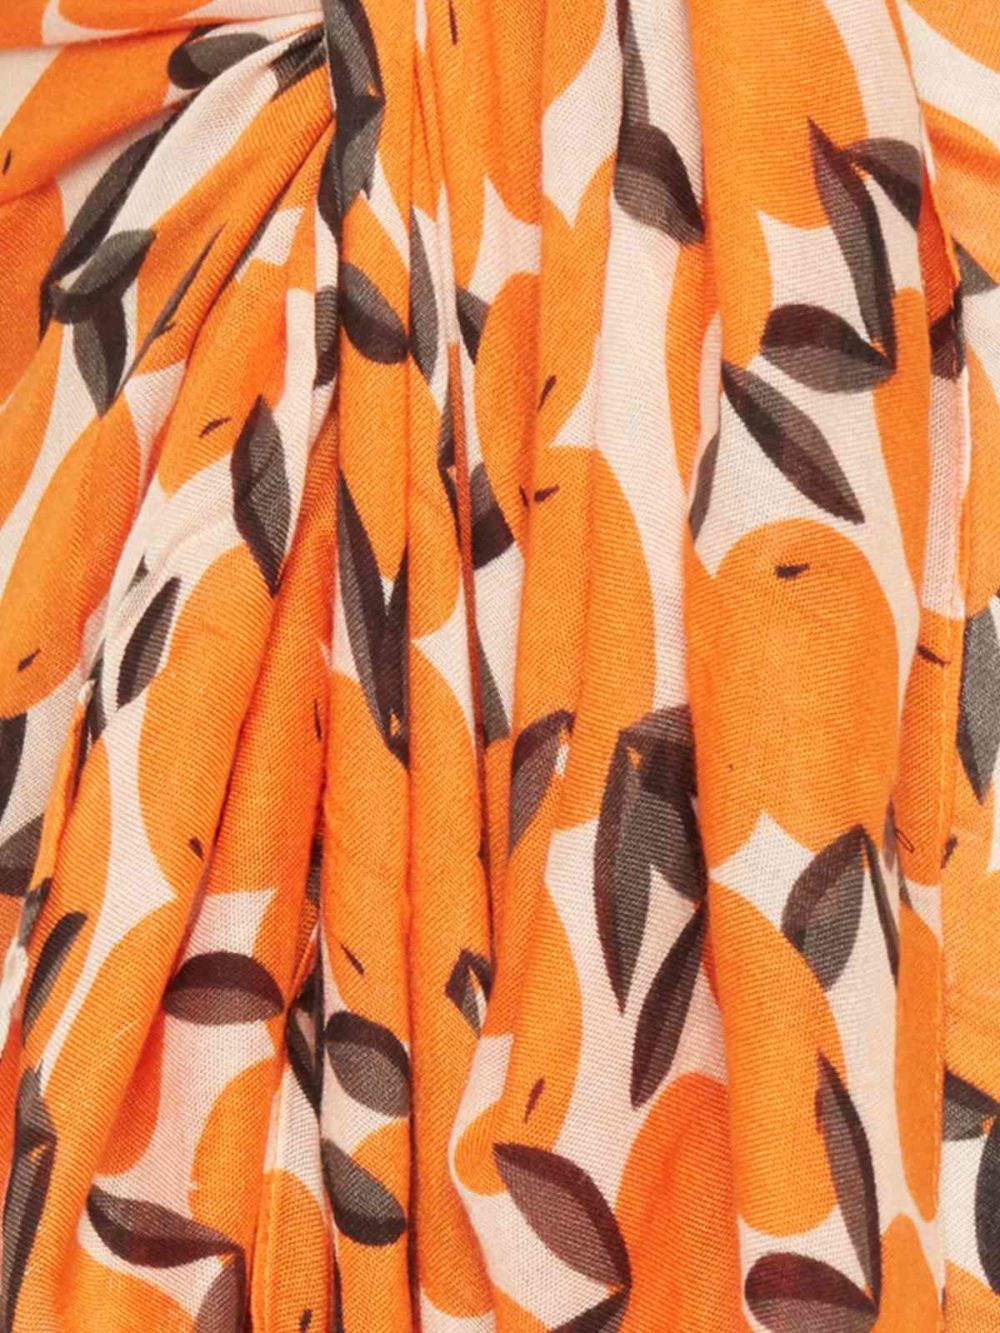 Vera Scarf ICHI Katie Kerr Women's Clothing